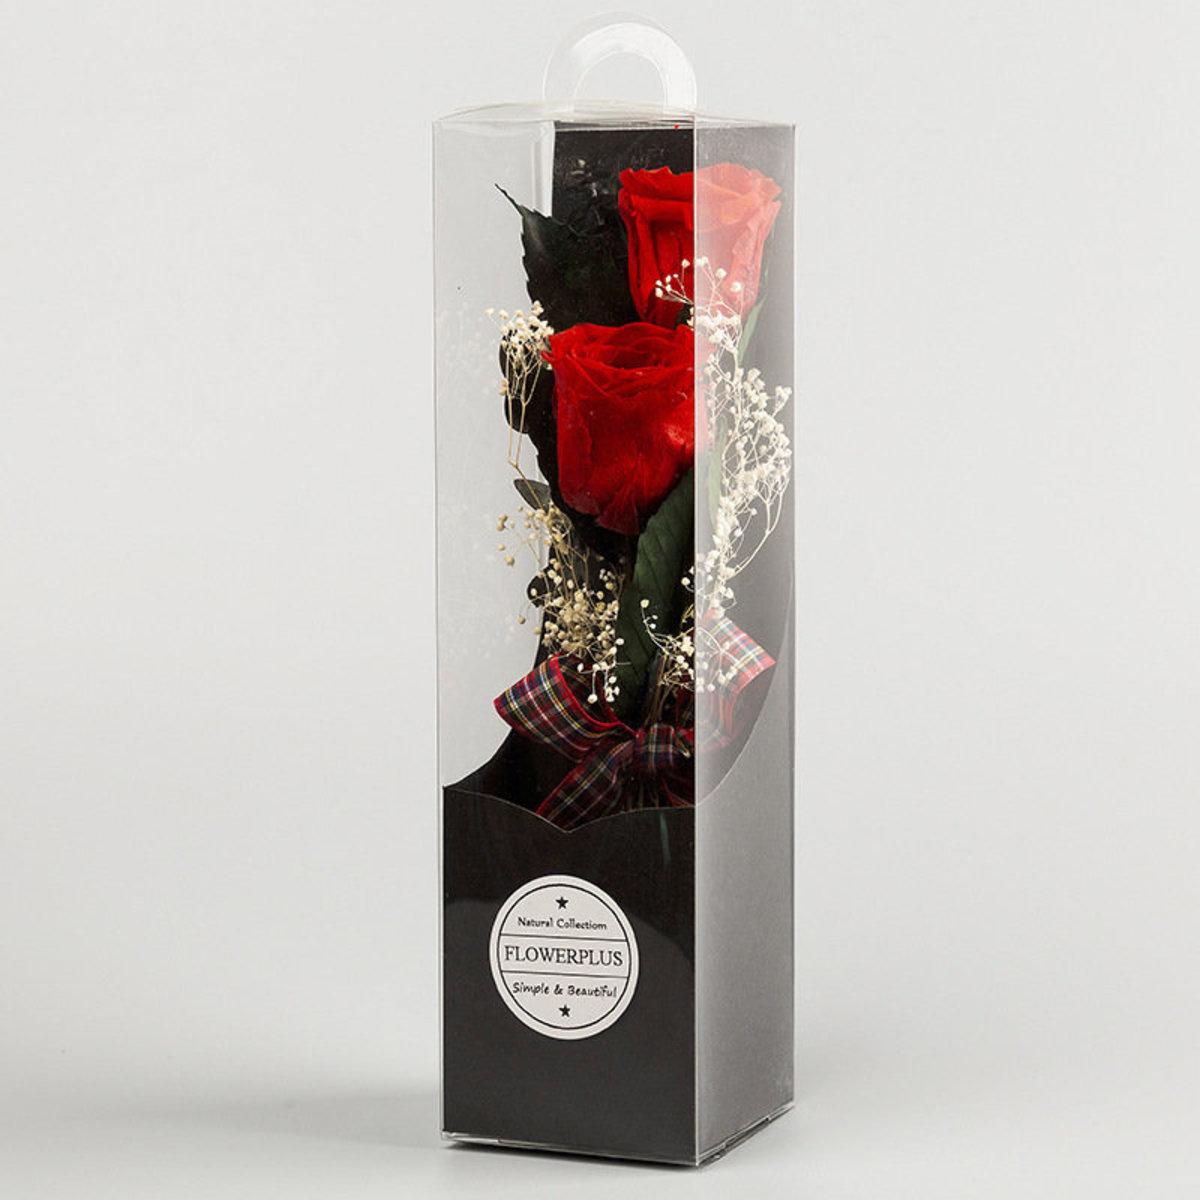 Le' Lamor Rose 情人節 小型永生花掛盒家居擺設 掛牆裝飾 (紅色)